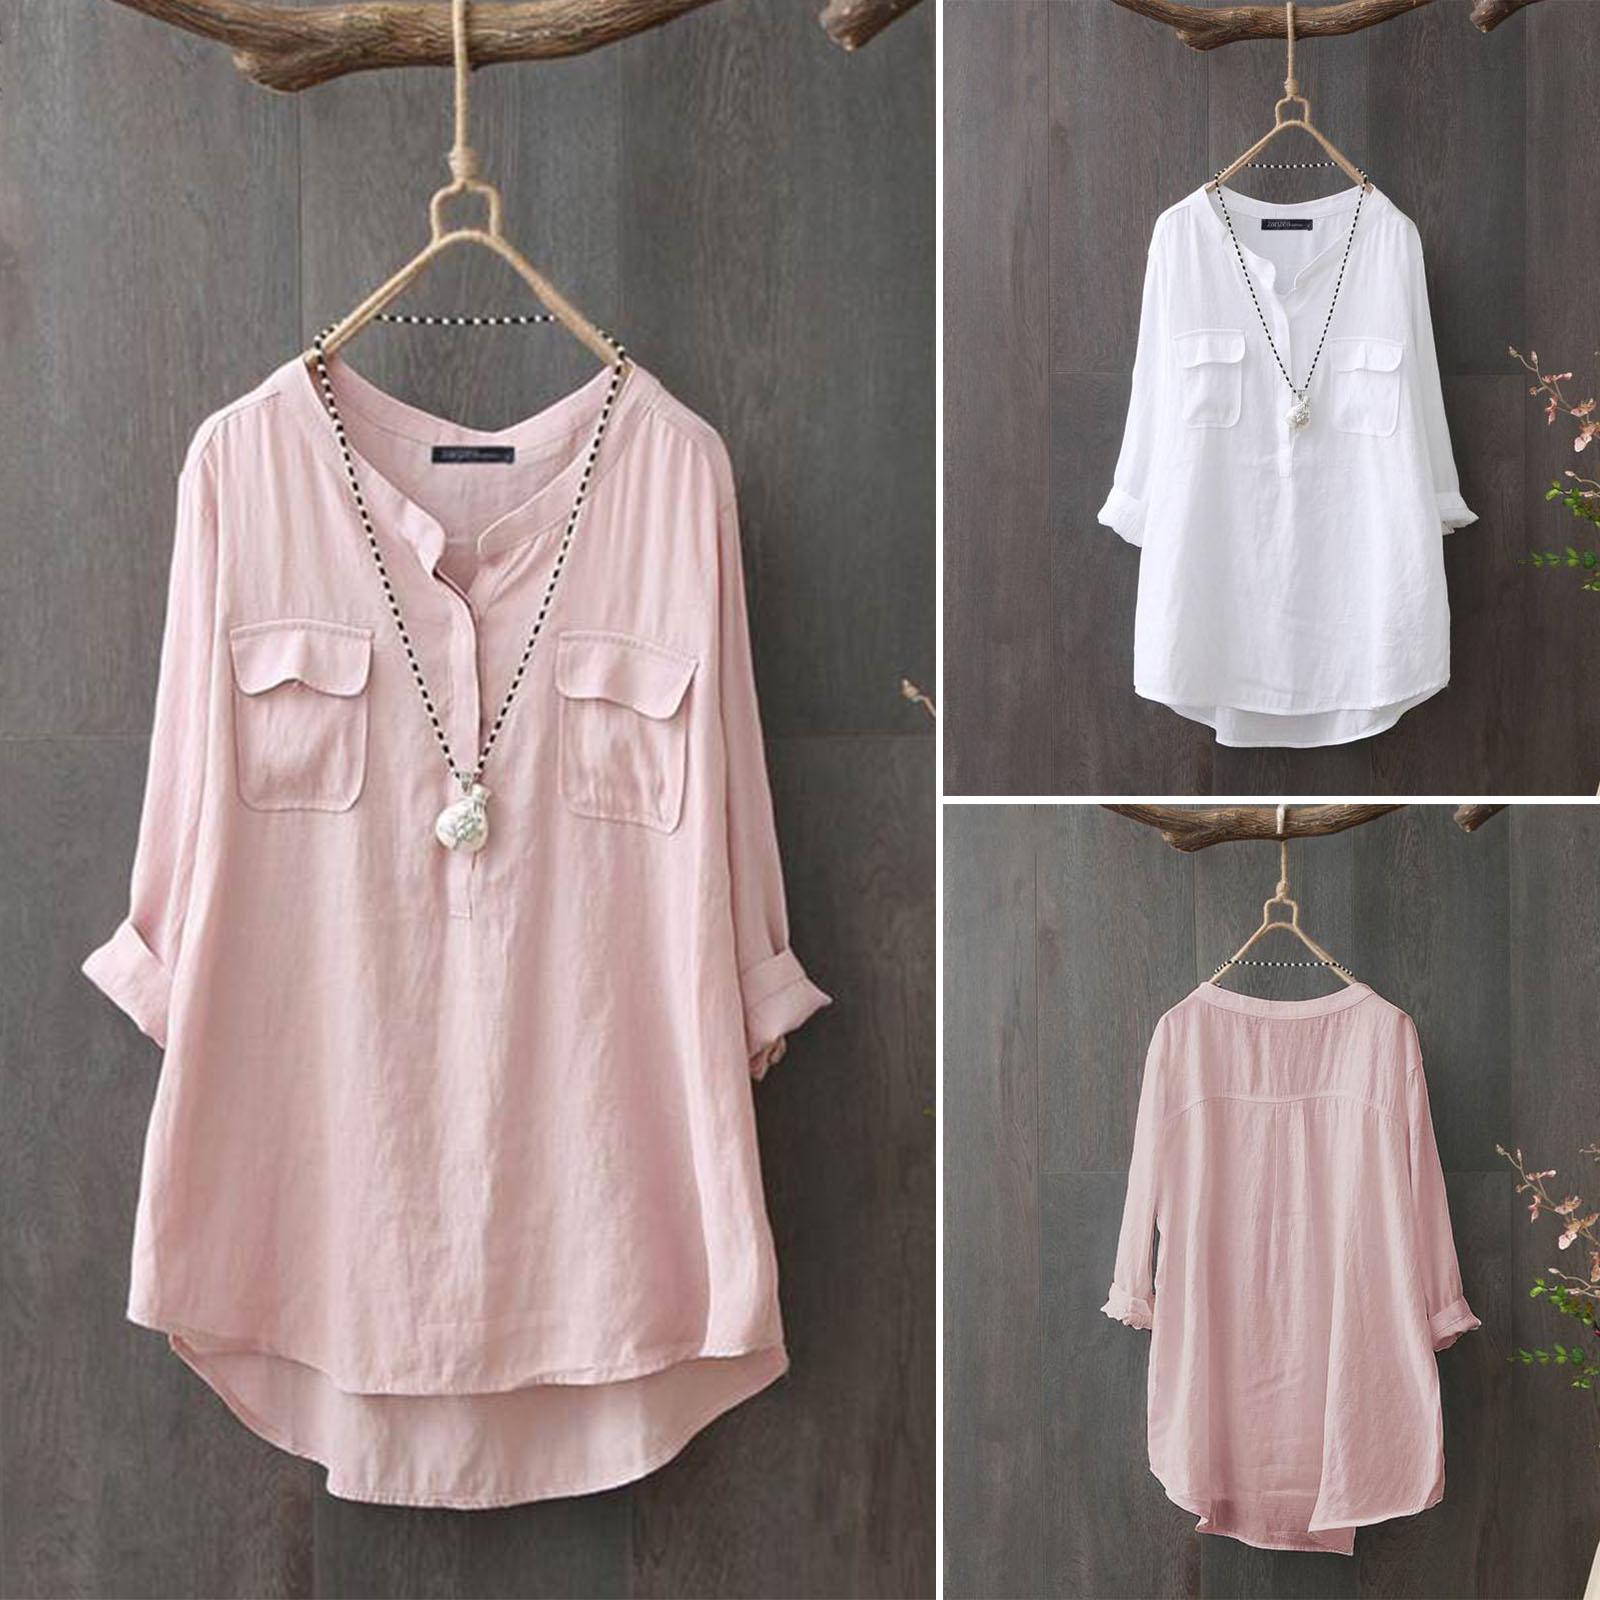 Women Buttons Casual Pocket Shirt Kurti